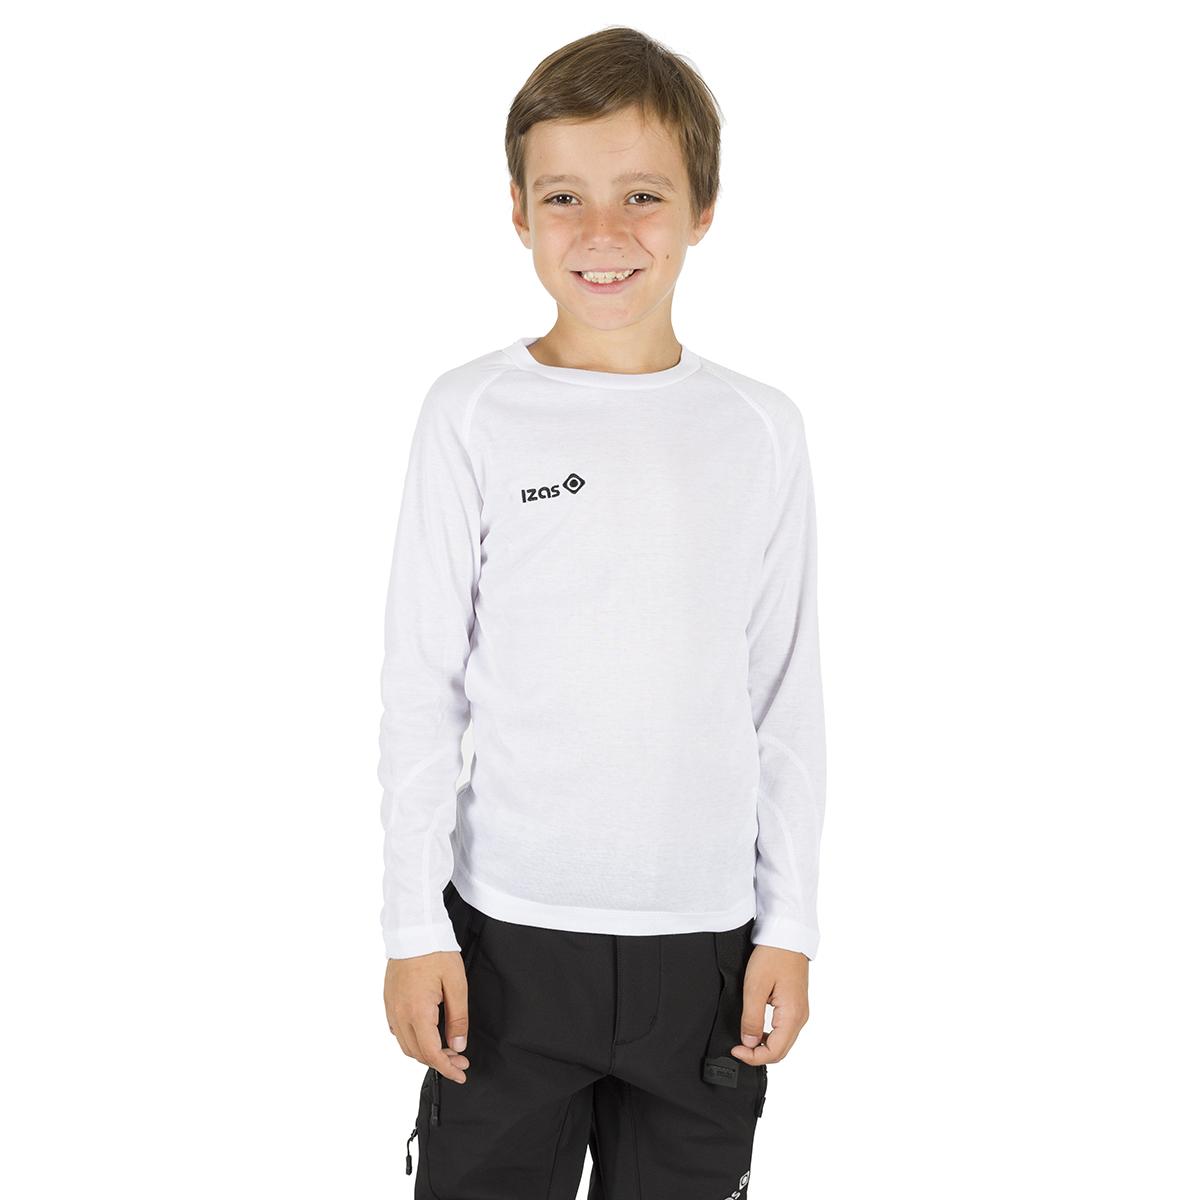 NELION KIDS THERMAL T-SHIRT WHITE